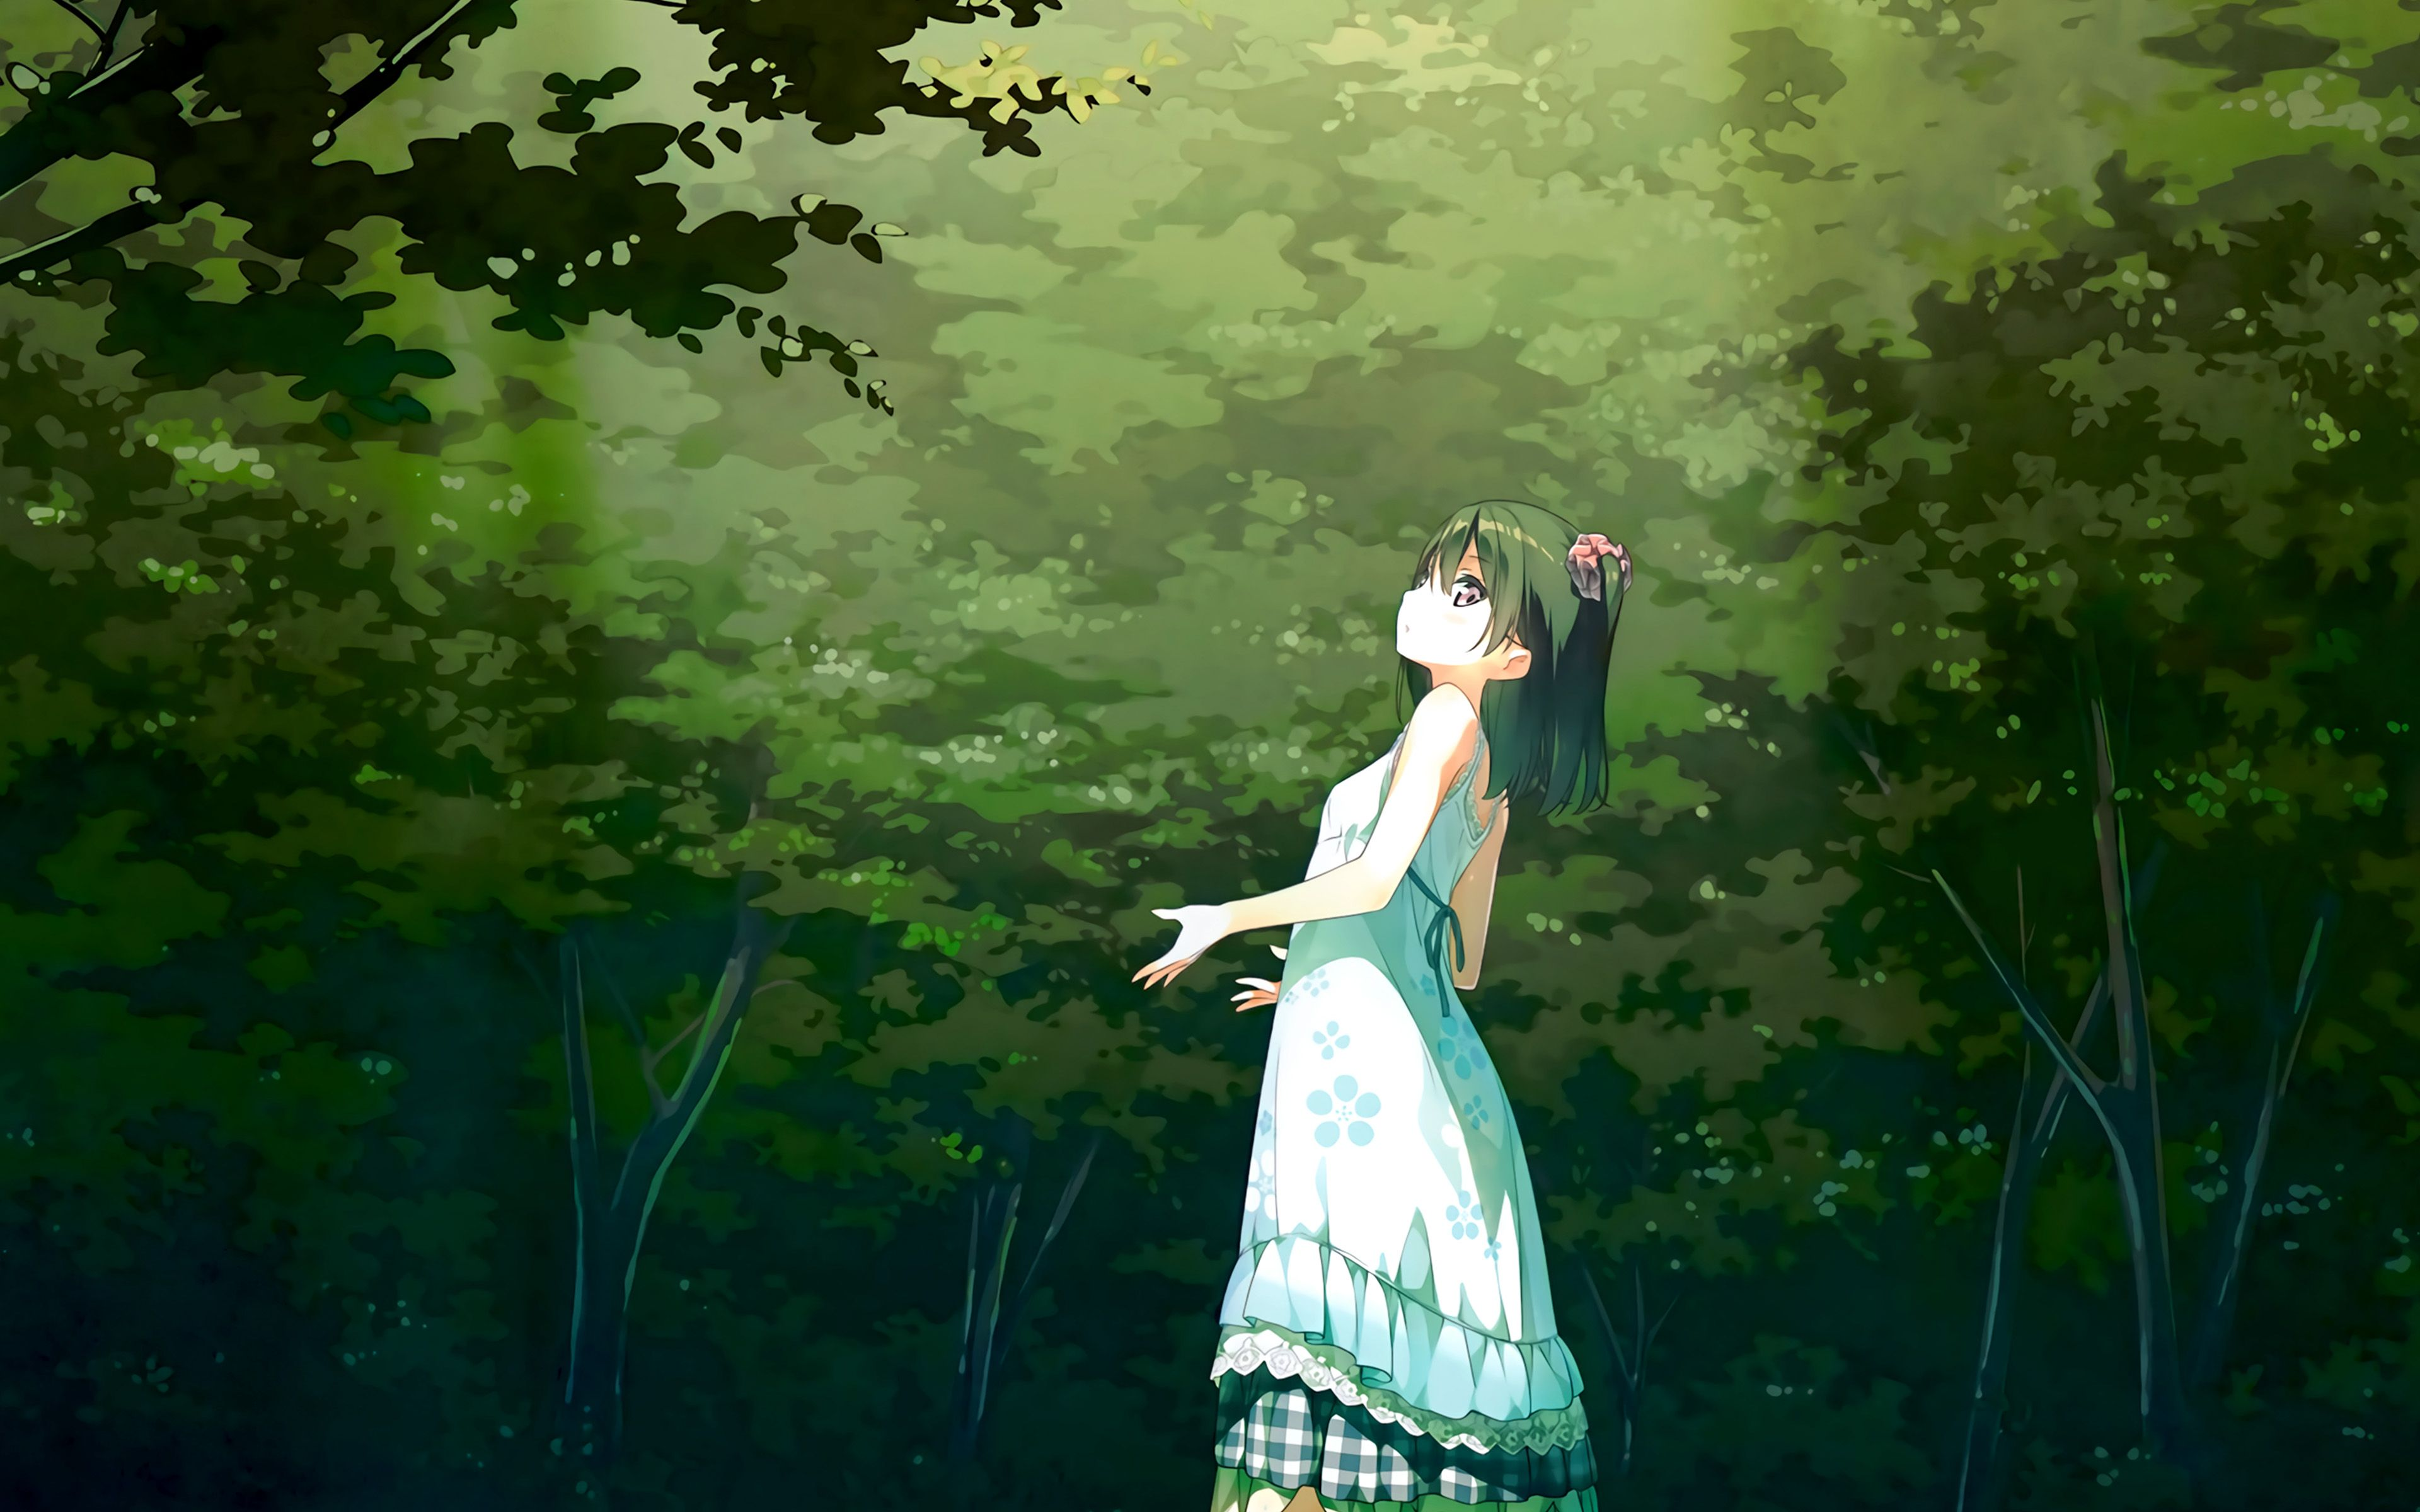 4k Light Green Anime Wallpapers - Wallpaper Cave